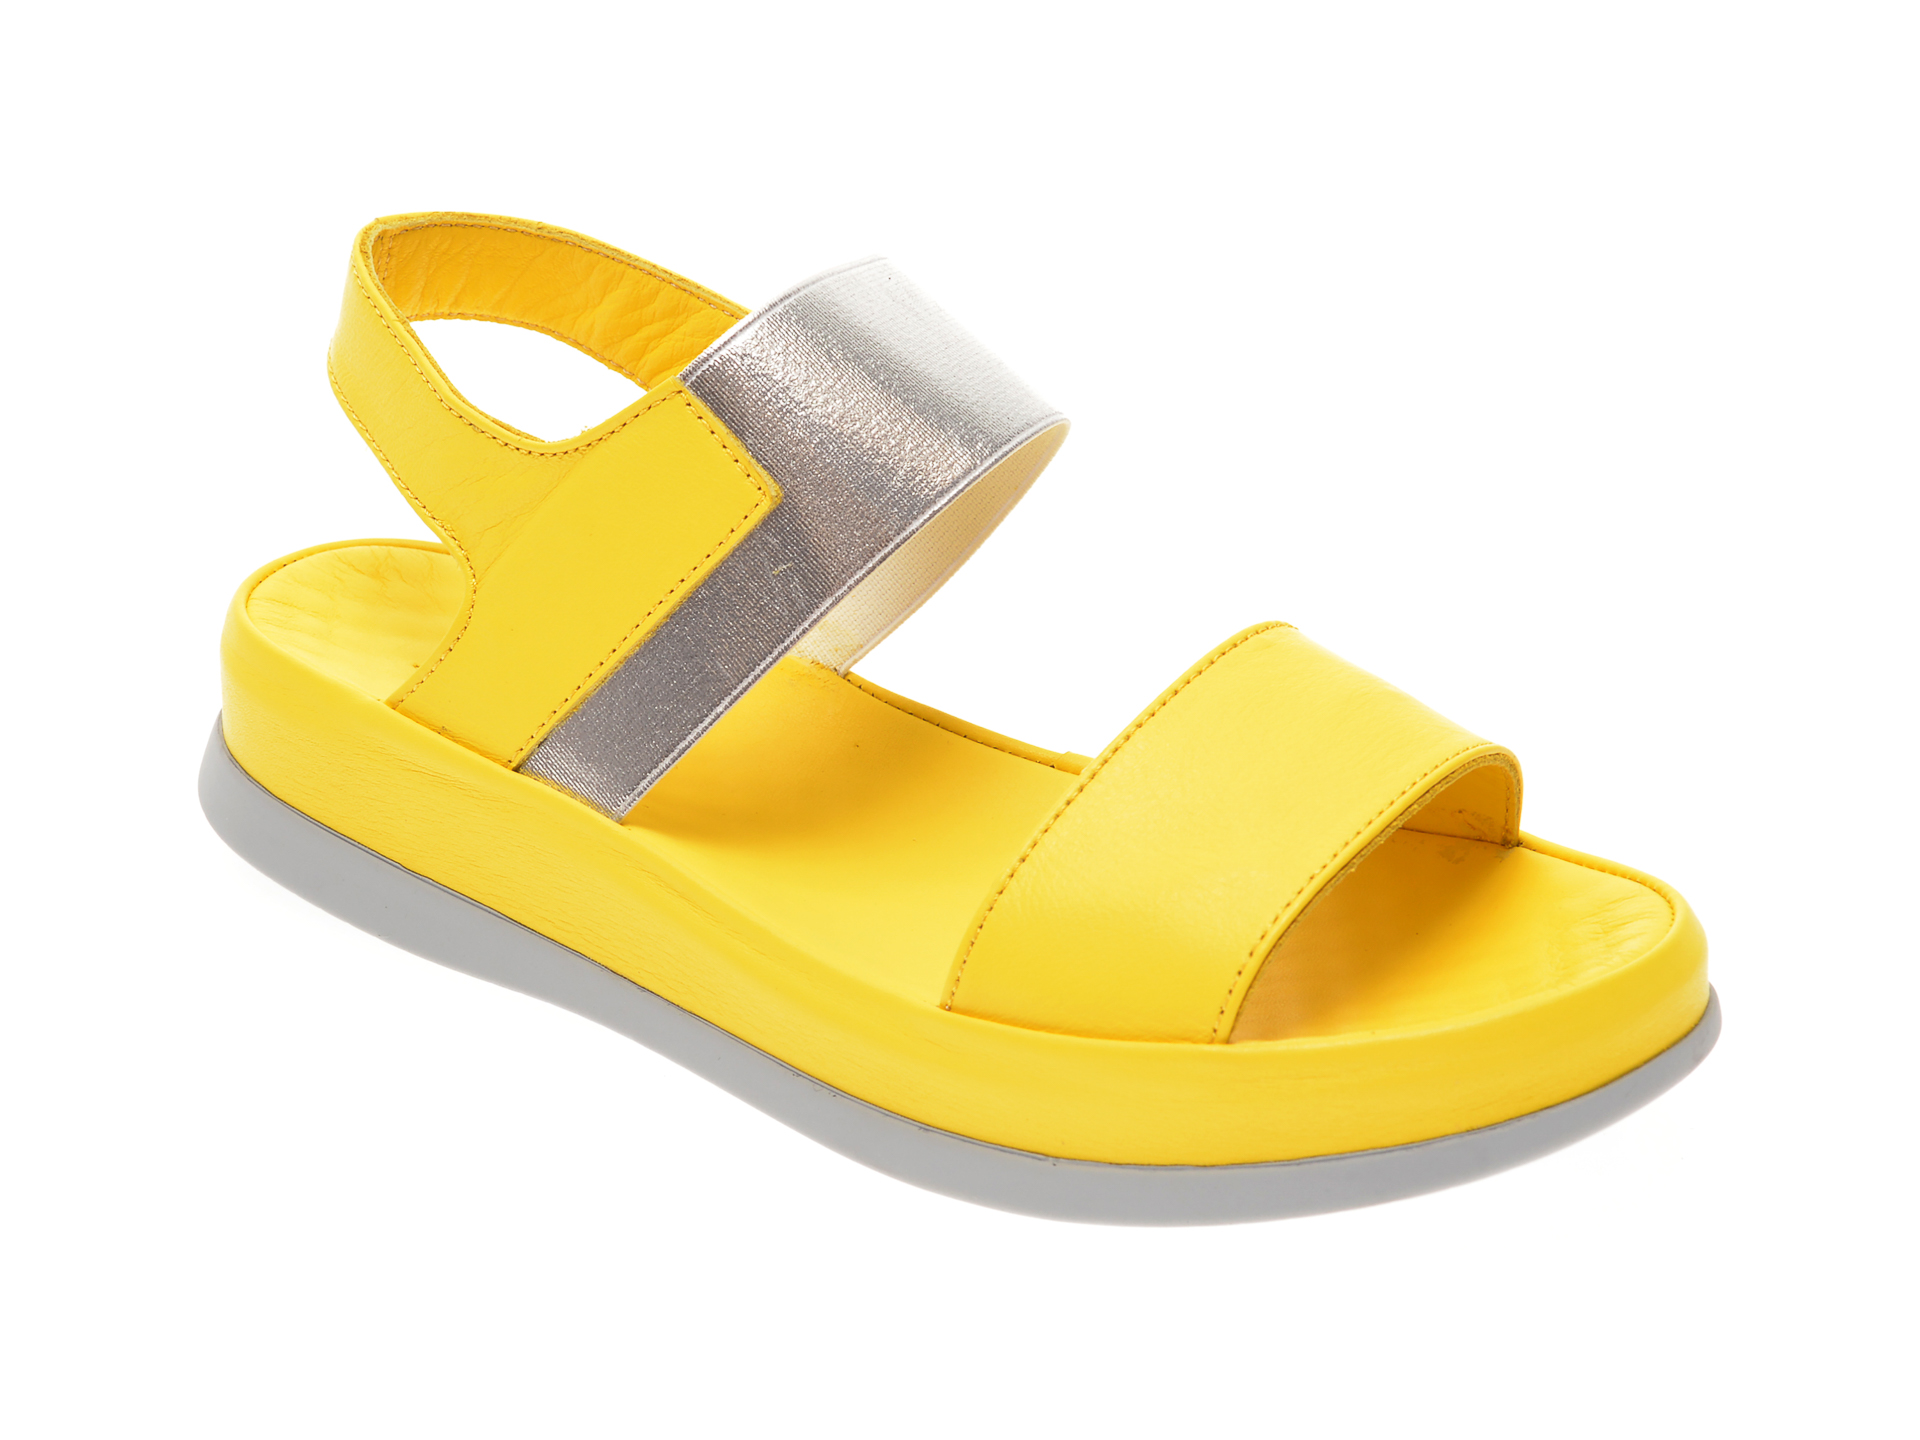 Sandale MISS LIZA galbene, 118PD02, din piele naturala